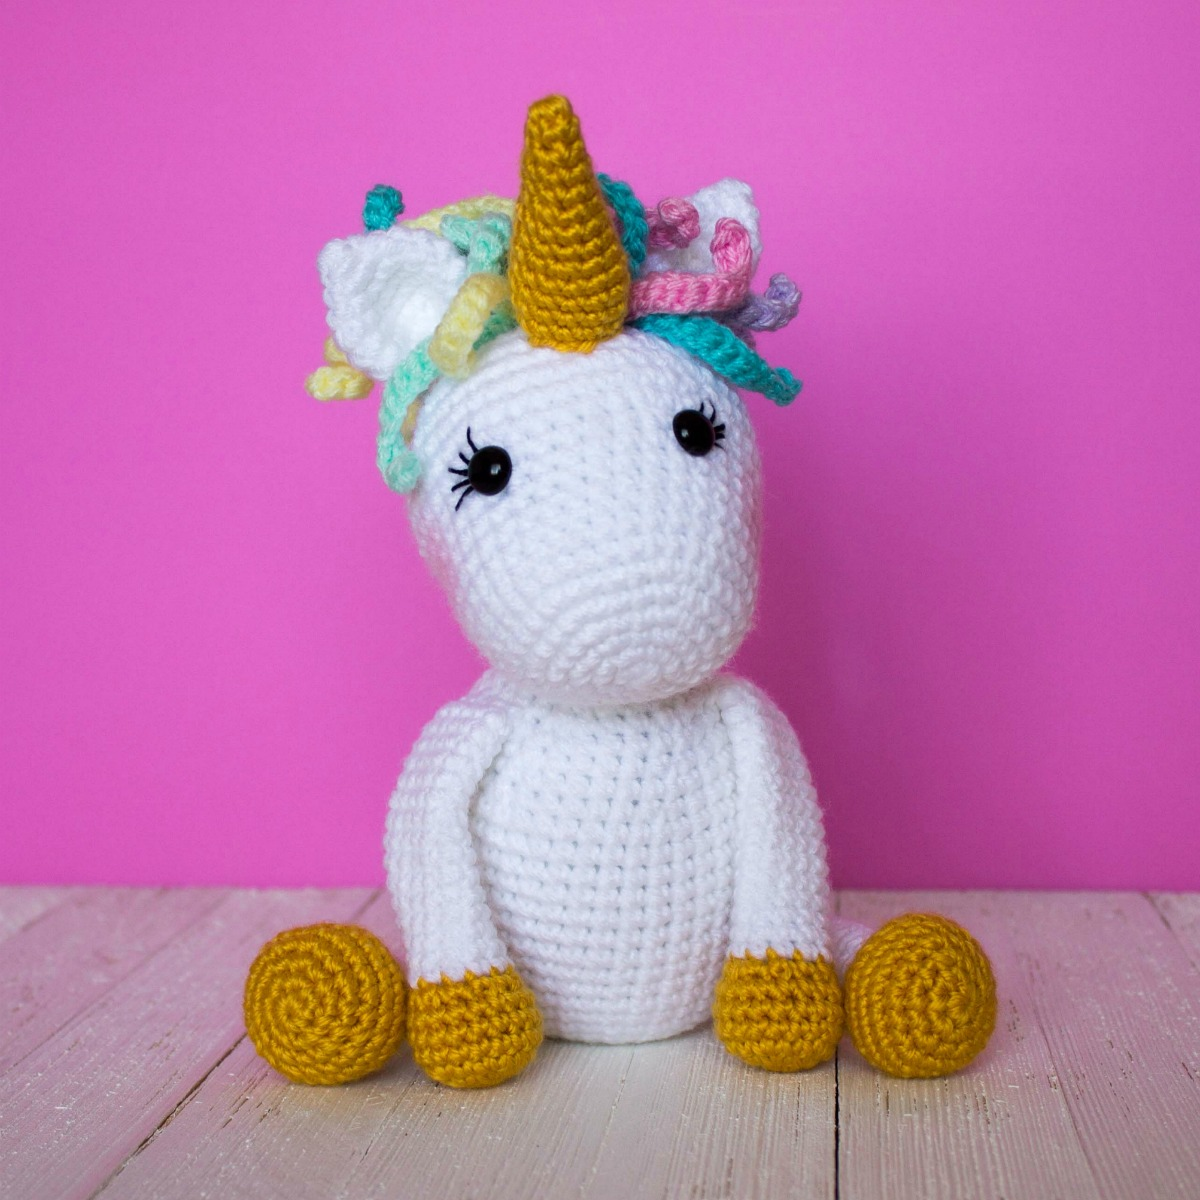 20 Most Amazing Unicorn Amigurumi Patterns | Crochet Arcade | 1200x1200